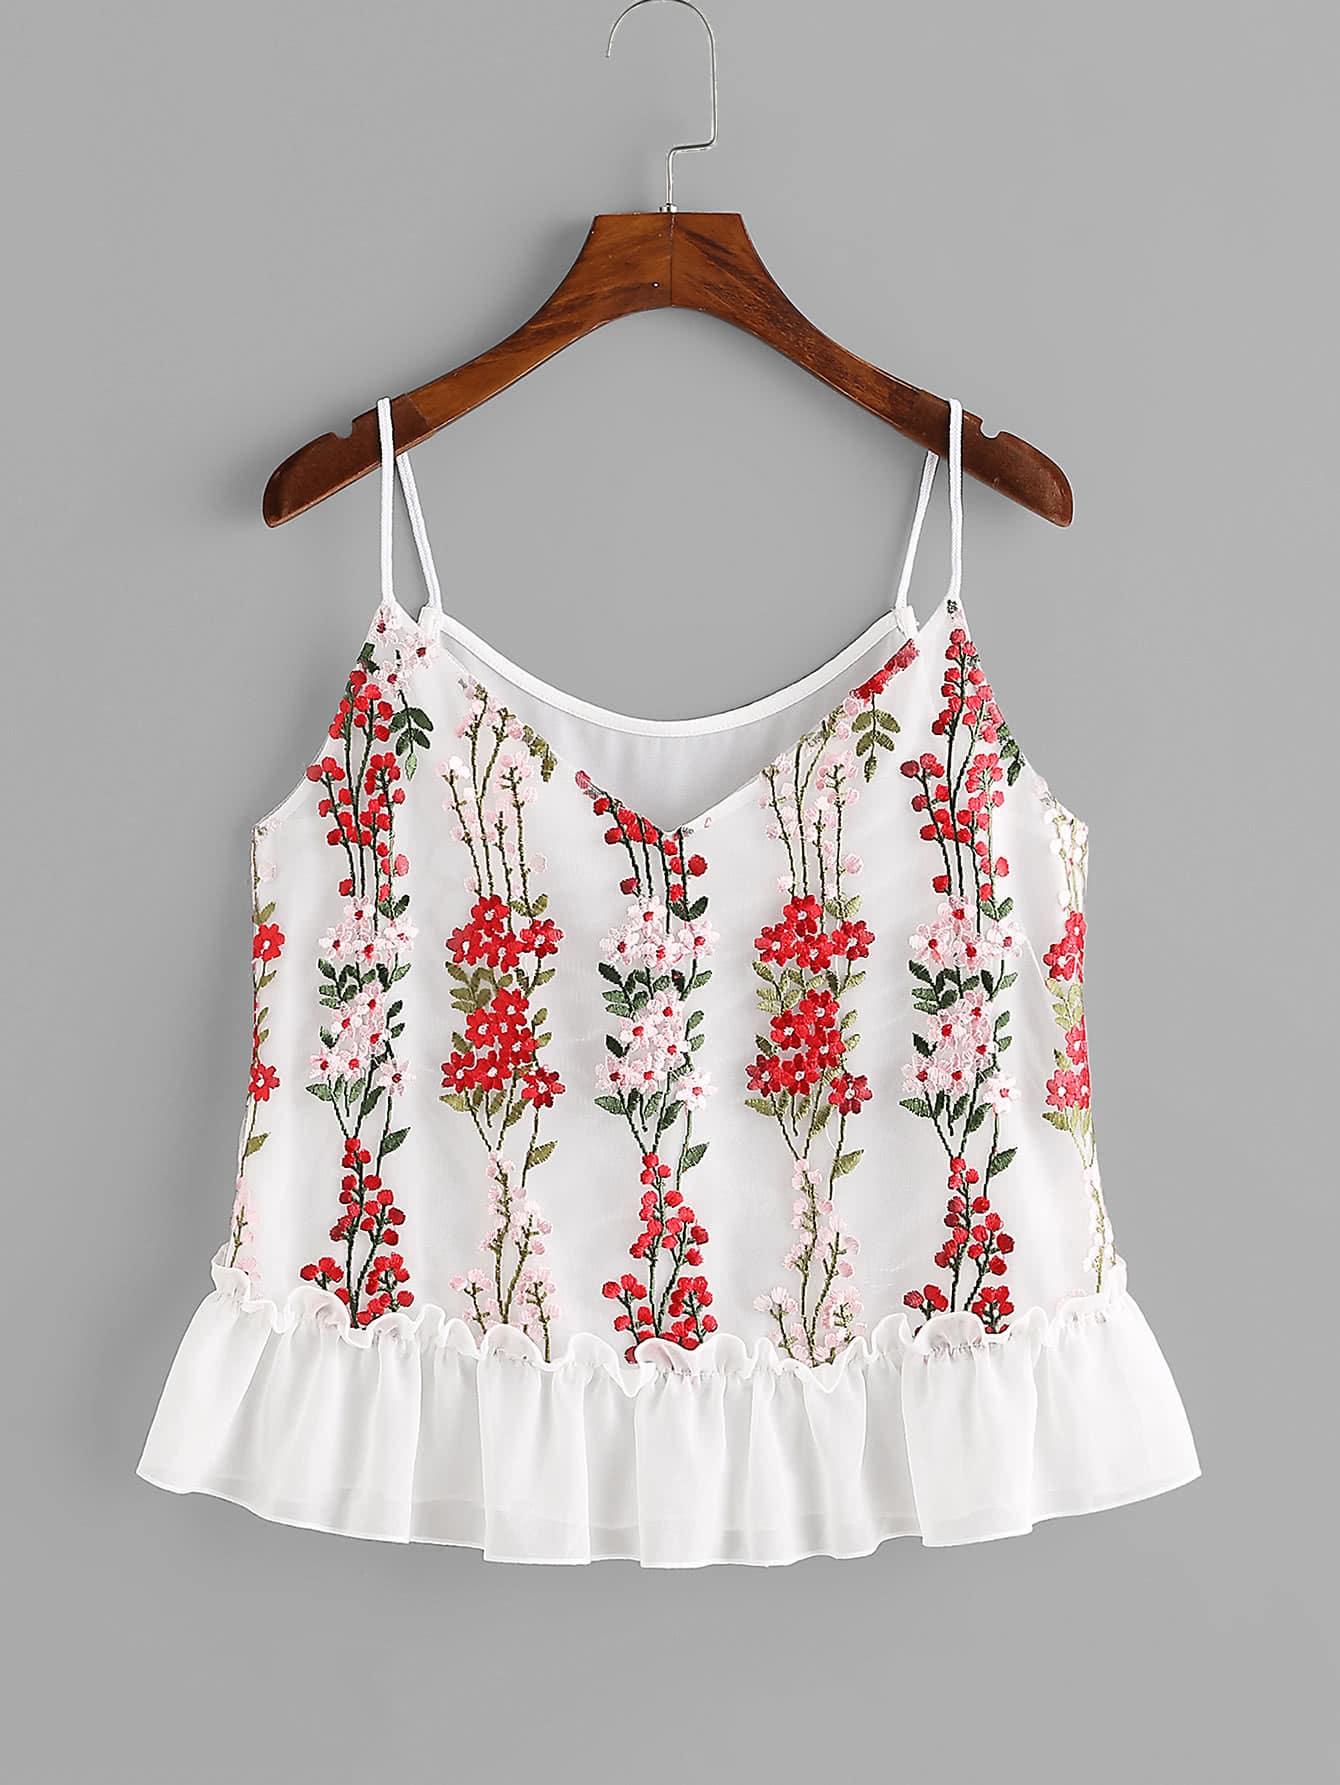 Фото Blossom Embroidery Tulle Overlay Ruffle Cami Top. Купить с доставкой